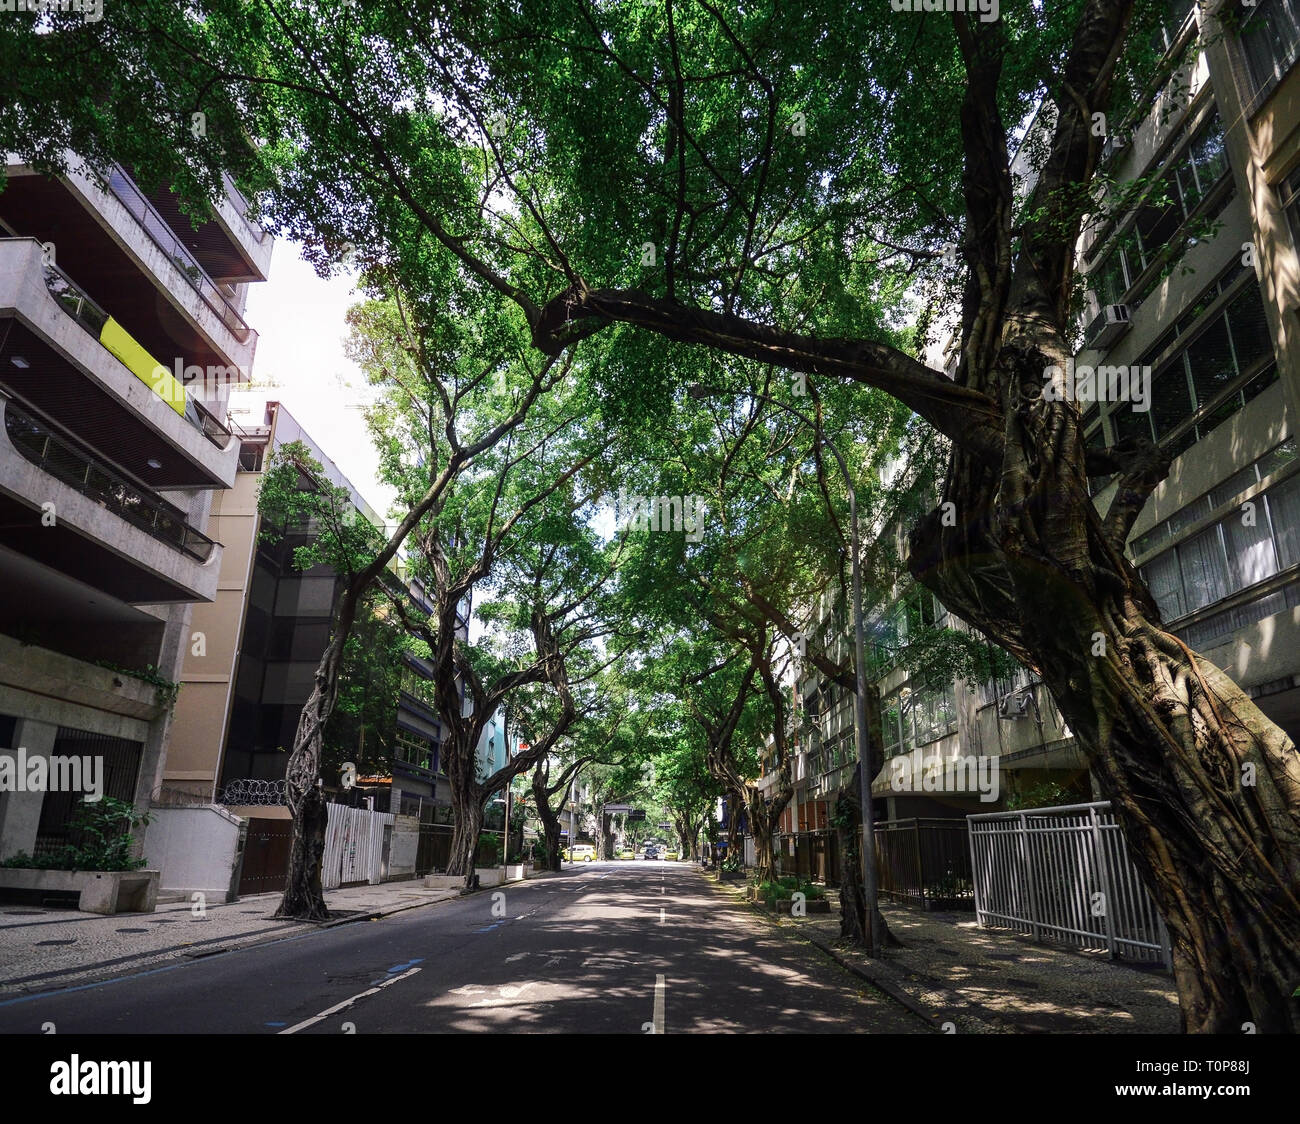 Vista de la avenida arbolada en Ipanema, Rio de Janeiro, Brasil. Imagen De Stock